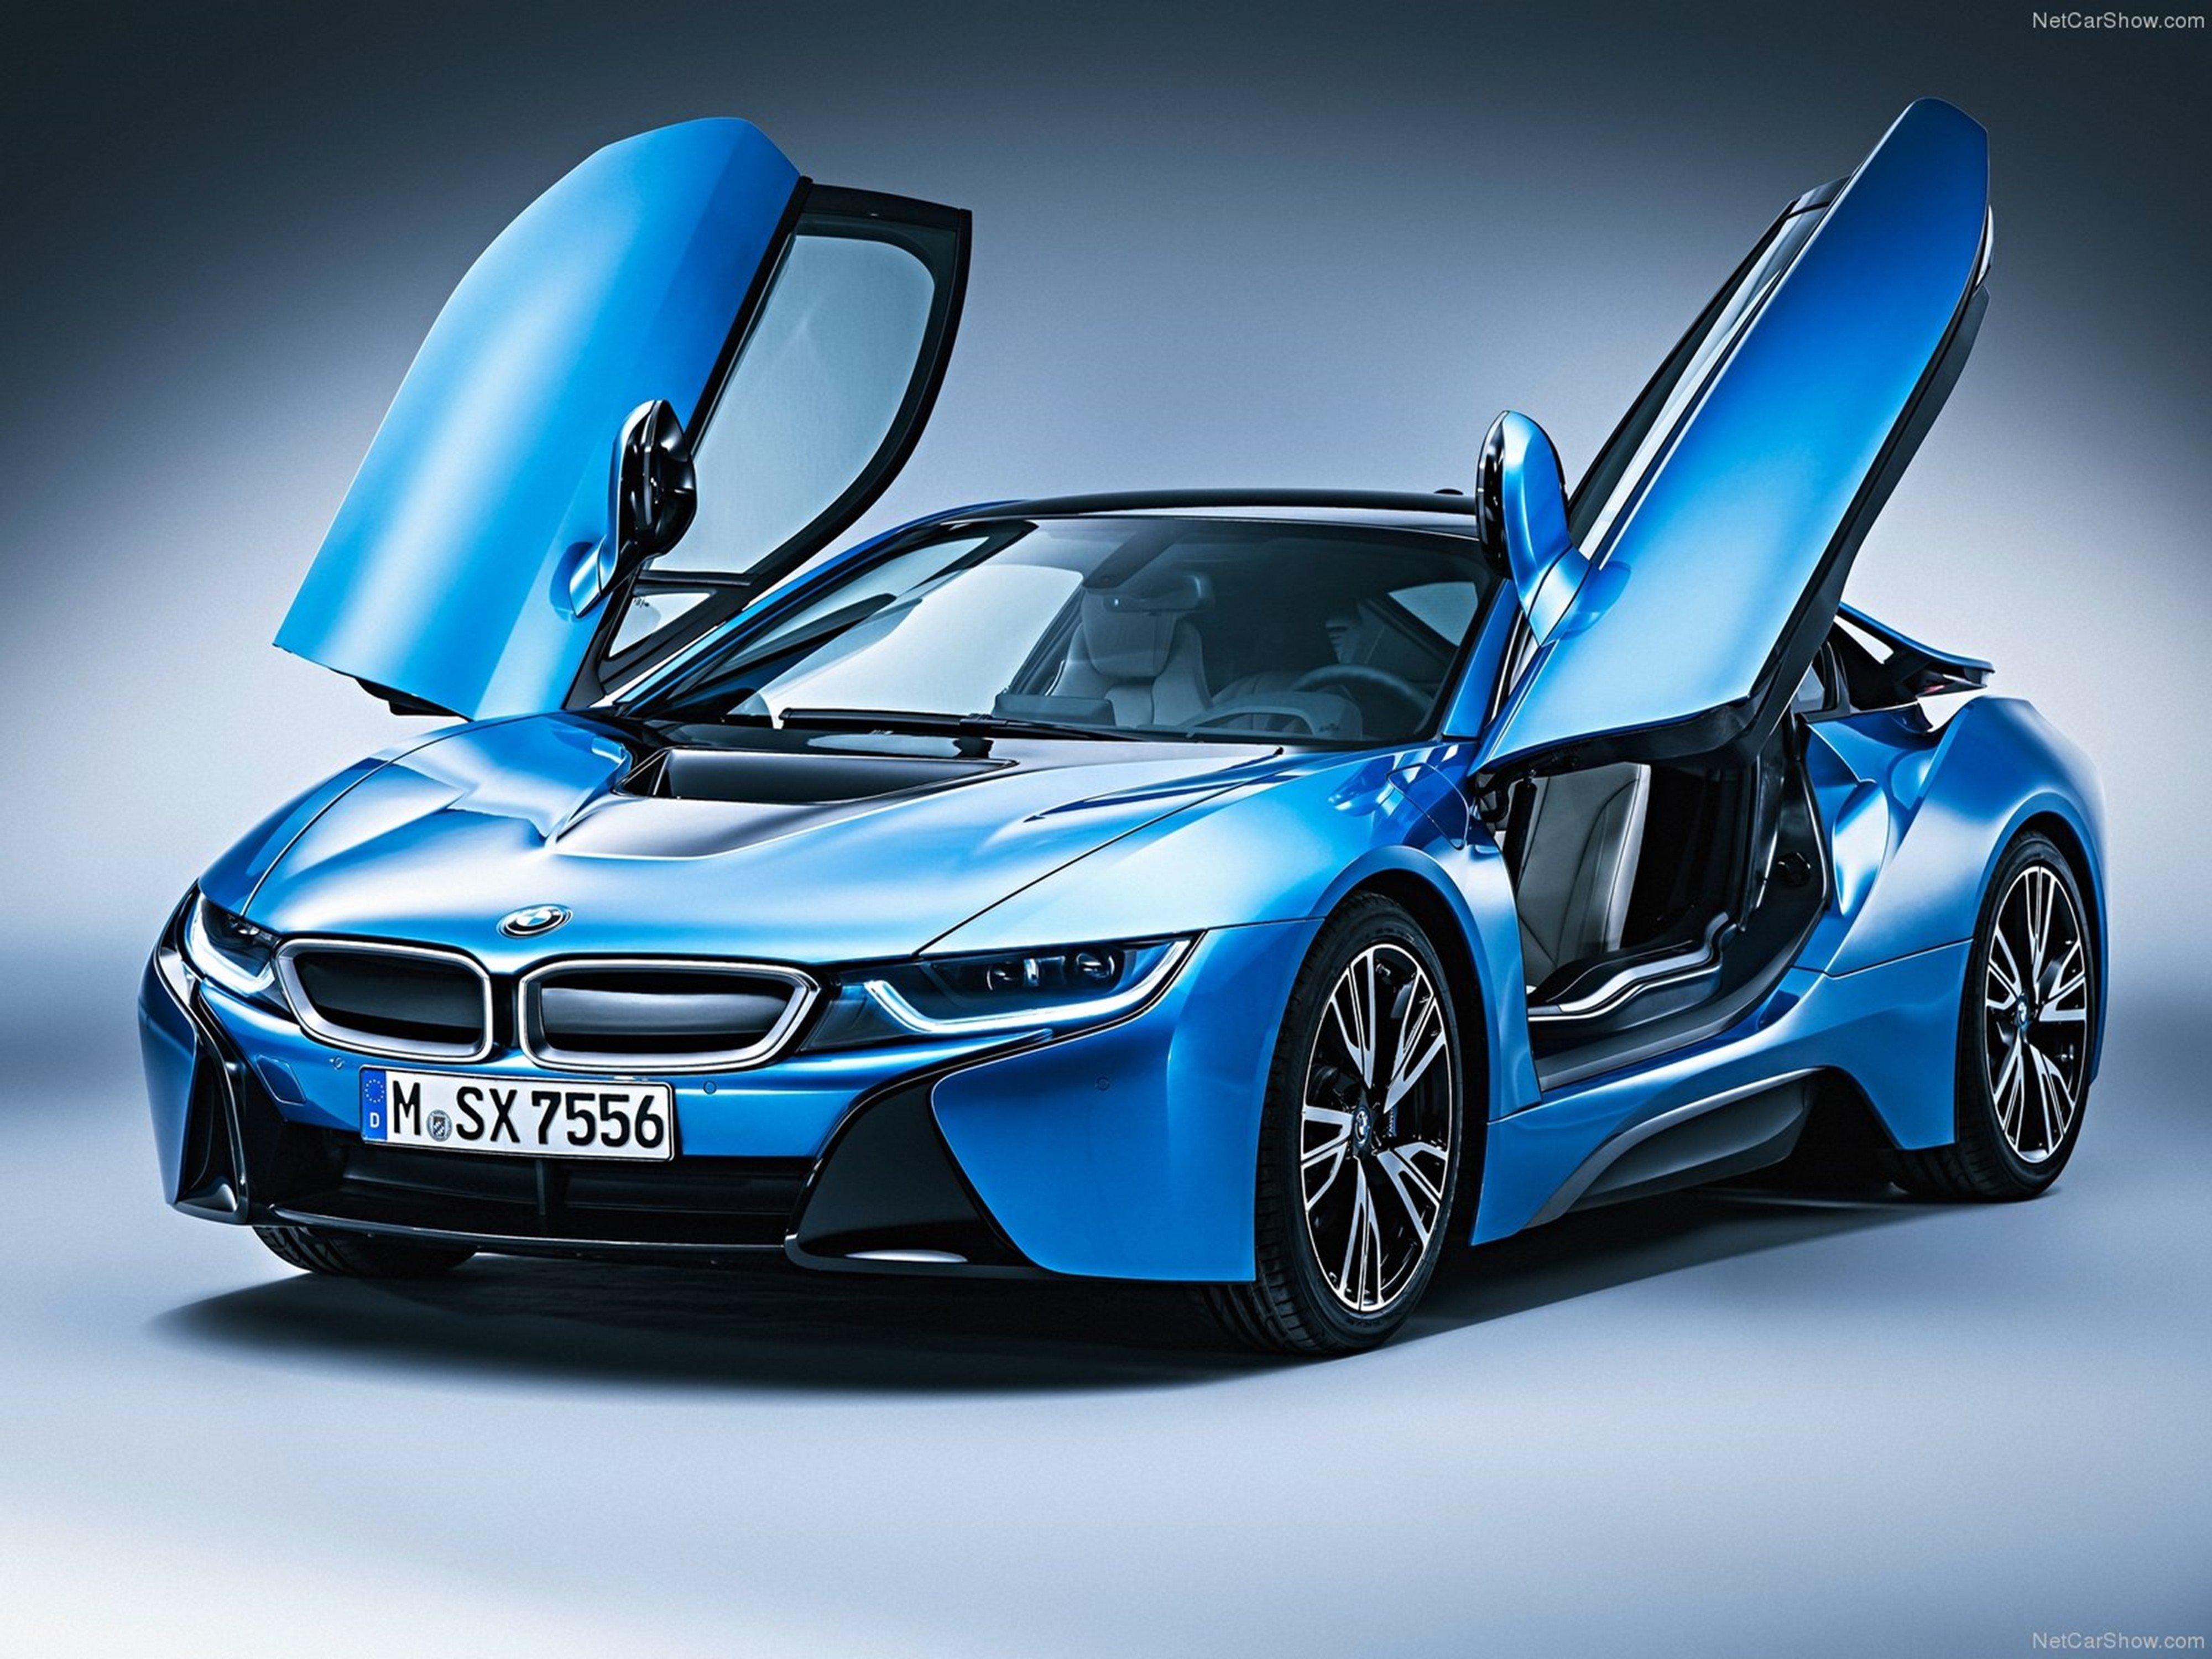 2015 BMW concept car sneak peek photos. - DesignApplause